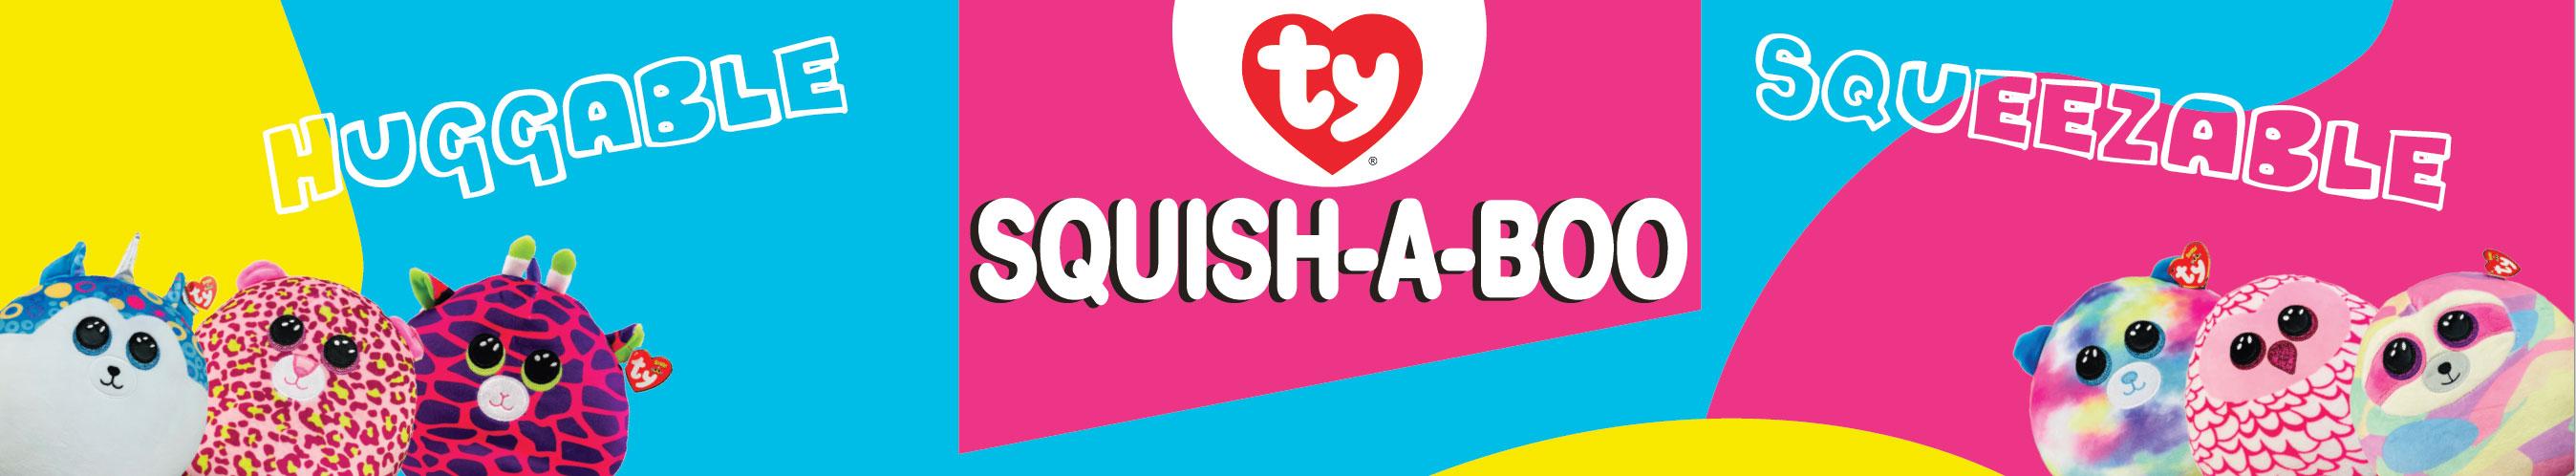 Shop Squish-A-Boos Now!